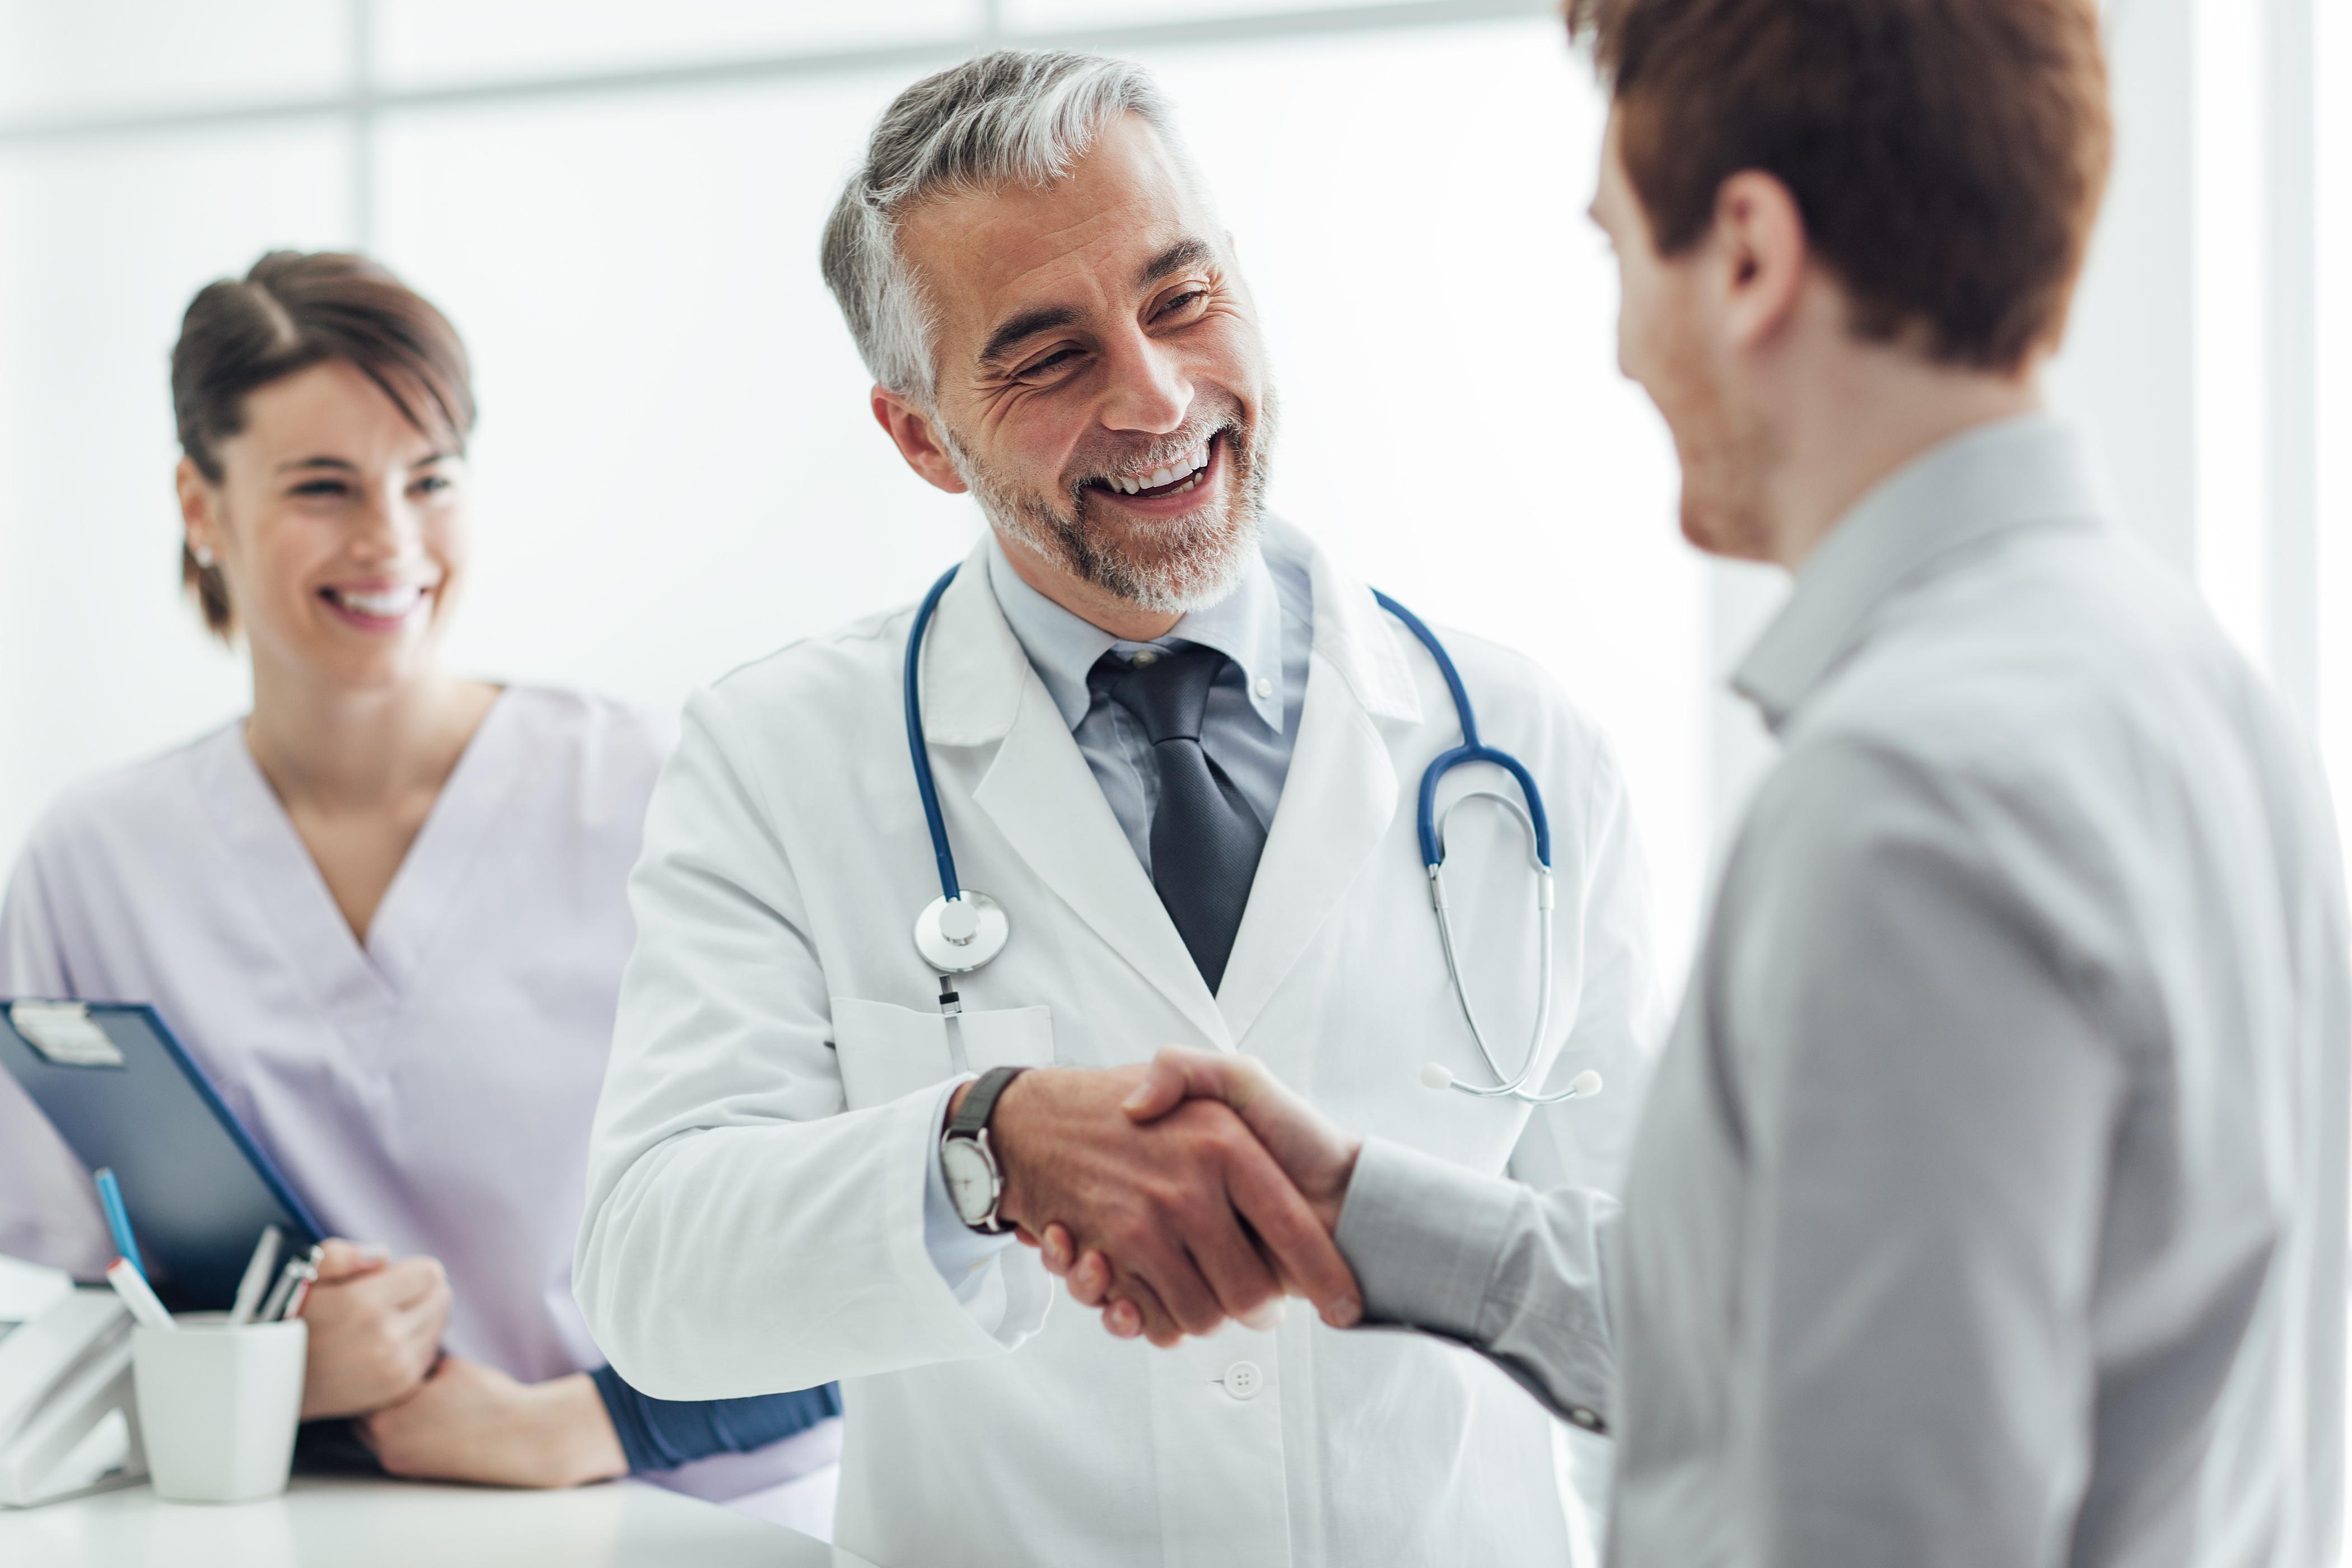 Doctoralia-como-fidelizar-pacientes.jpg